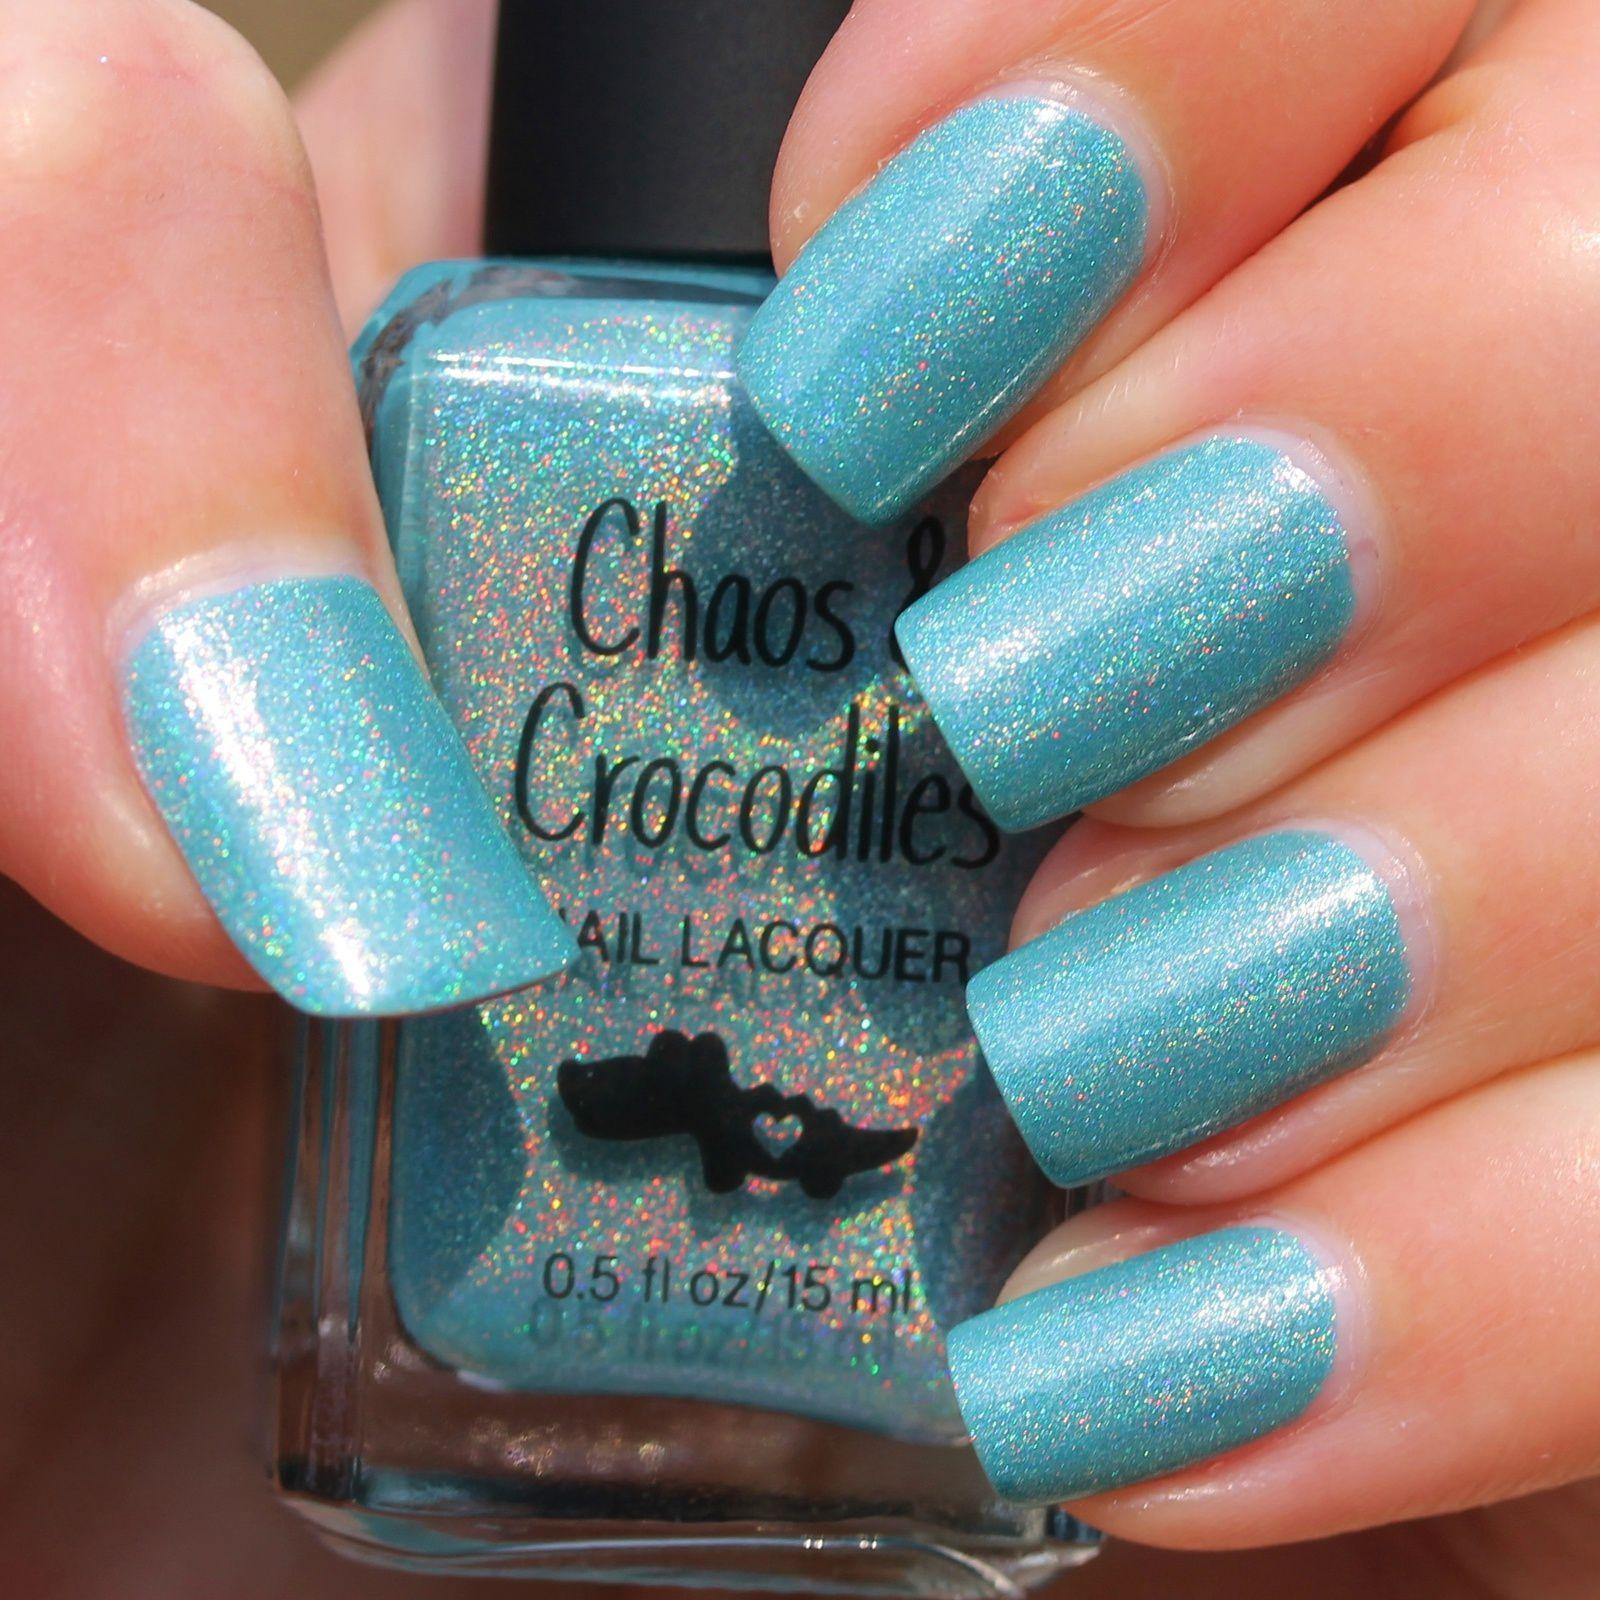 Chaos & Crocodiles Bluebeary (2 coats, no base coat, no top coat)